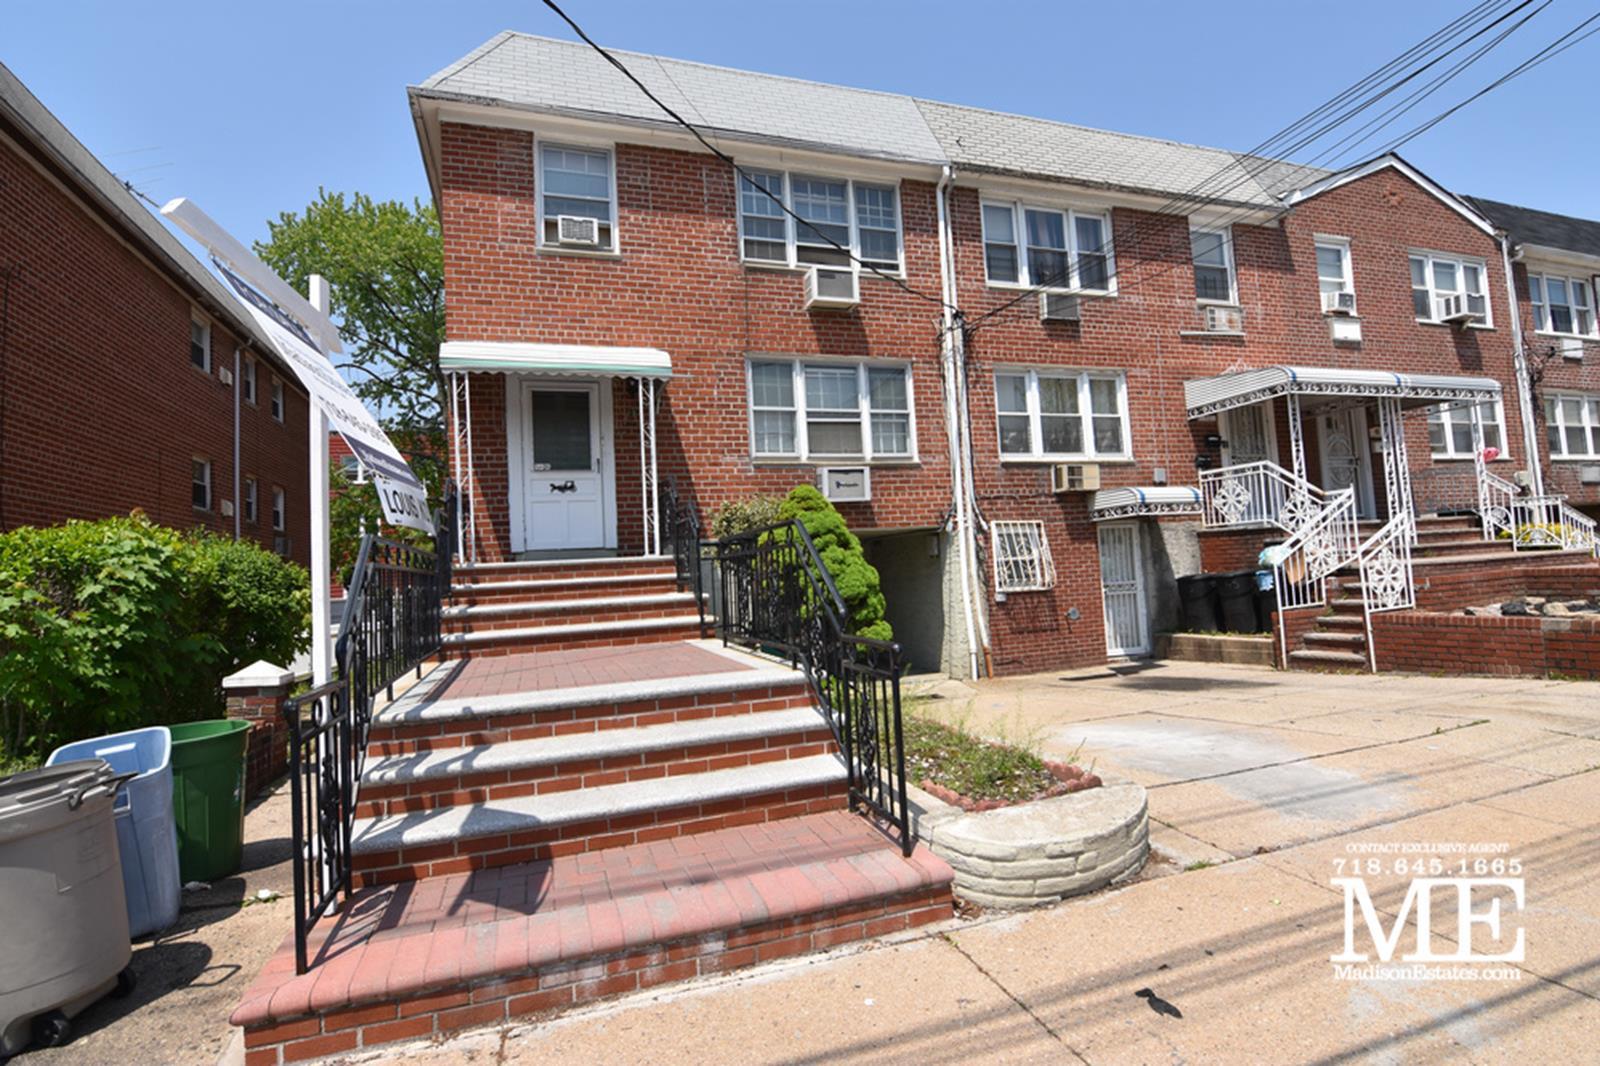 39 Paerdegat 4th Street Canarsie Brooklyn NY 11236